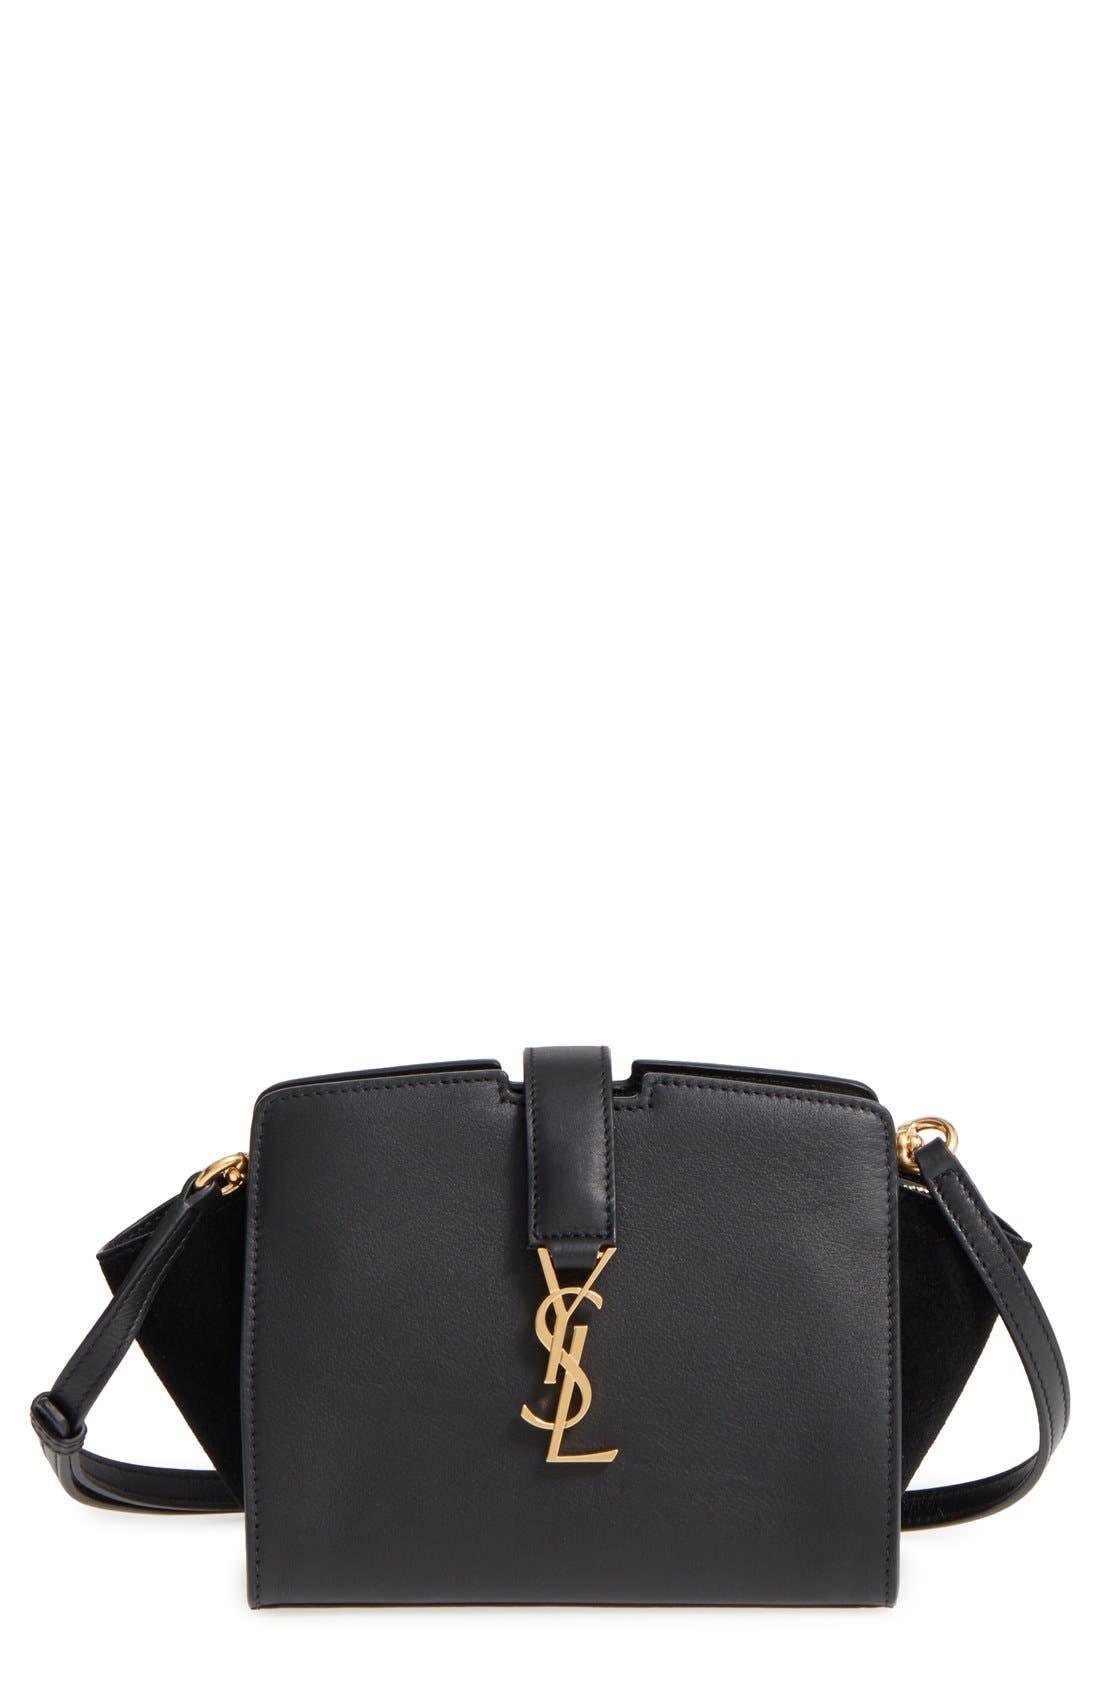 Main Image - Saint Laurent Toy Cabas Leather Crossbody Bag